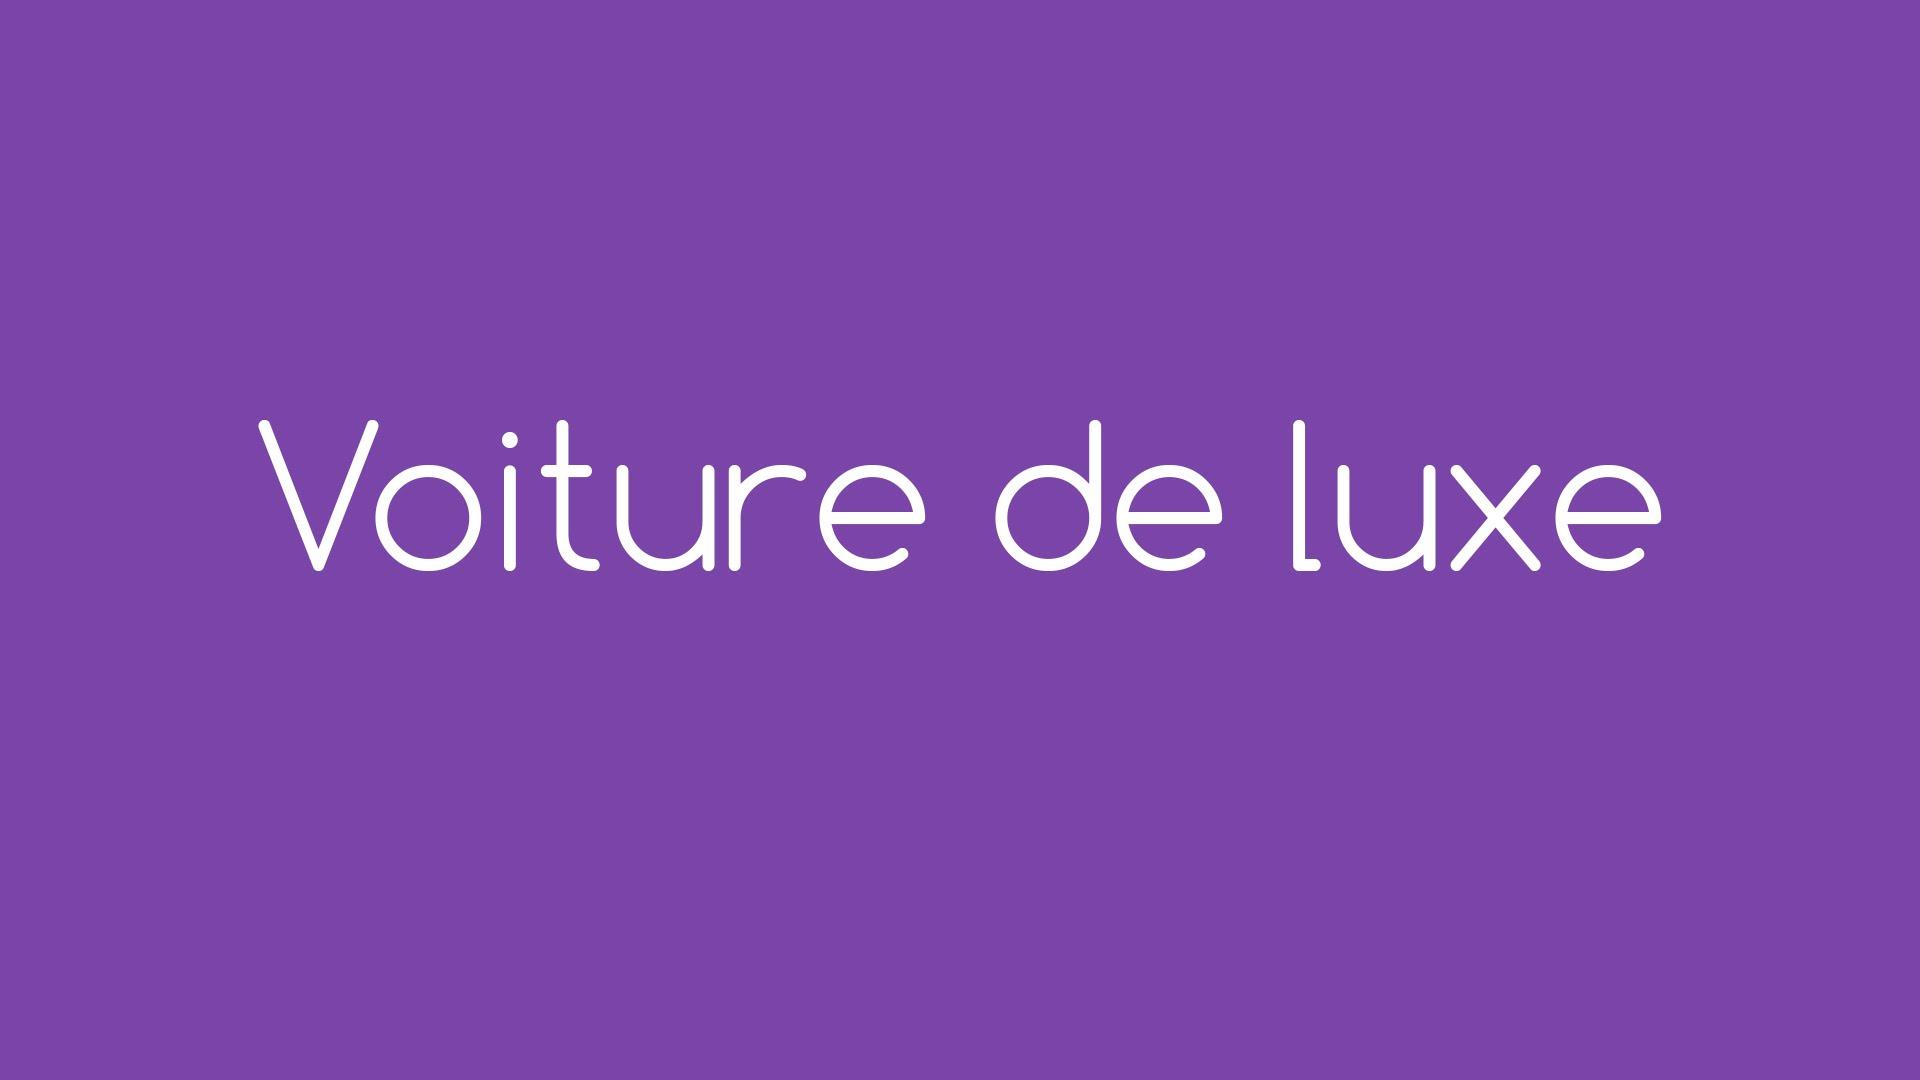 voiture de fonction avantage en nature tunisie. Black Bedroom Furniture Sets. Home Design Ideas